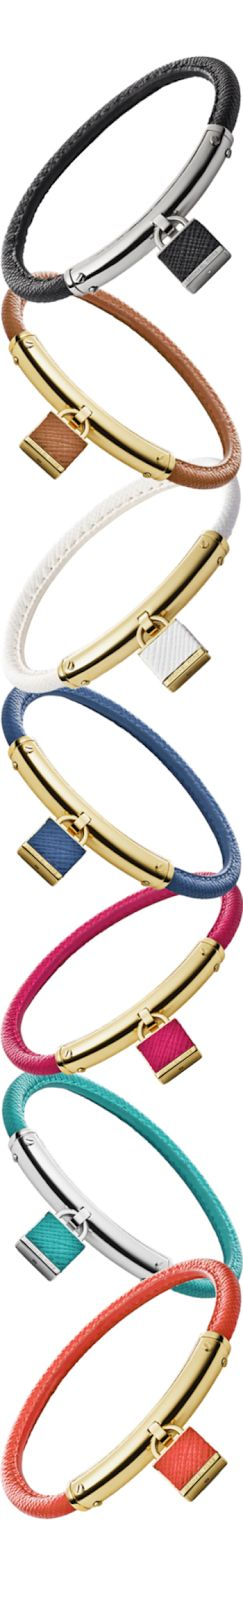 Michael Kors Leather Padlock Bracelet